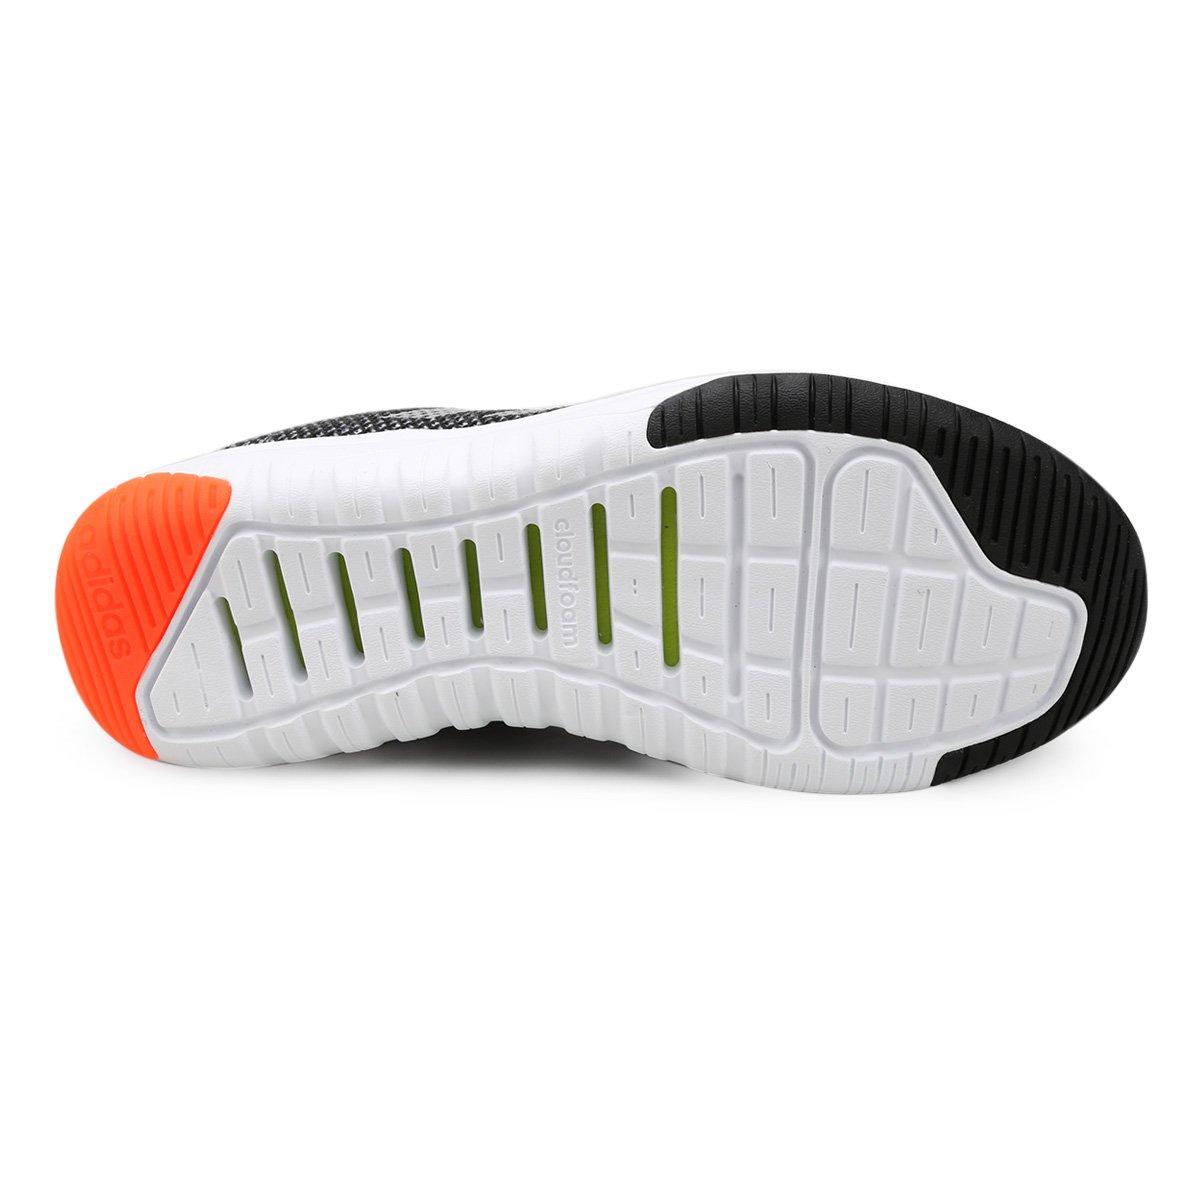 7639afdd6a Tênis Adidas CF Super Flex Masculino - Compre Agora